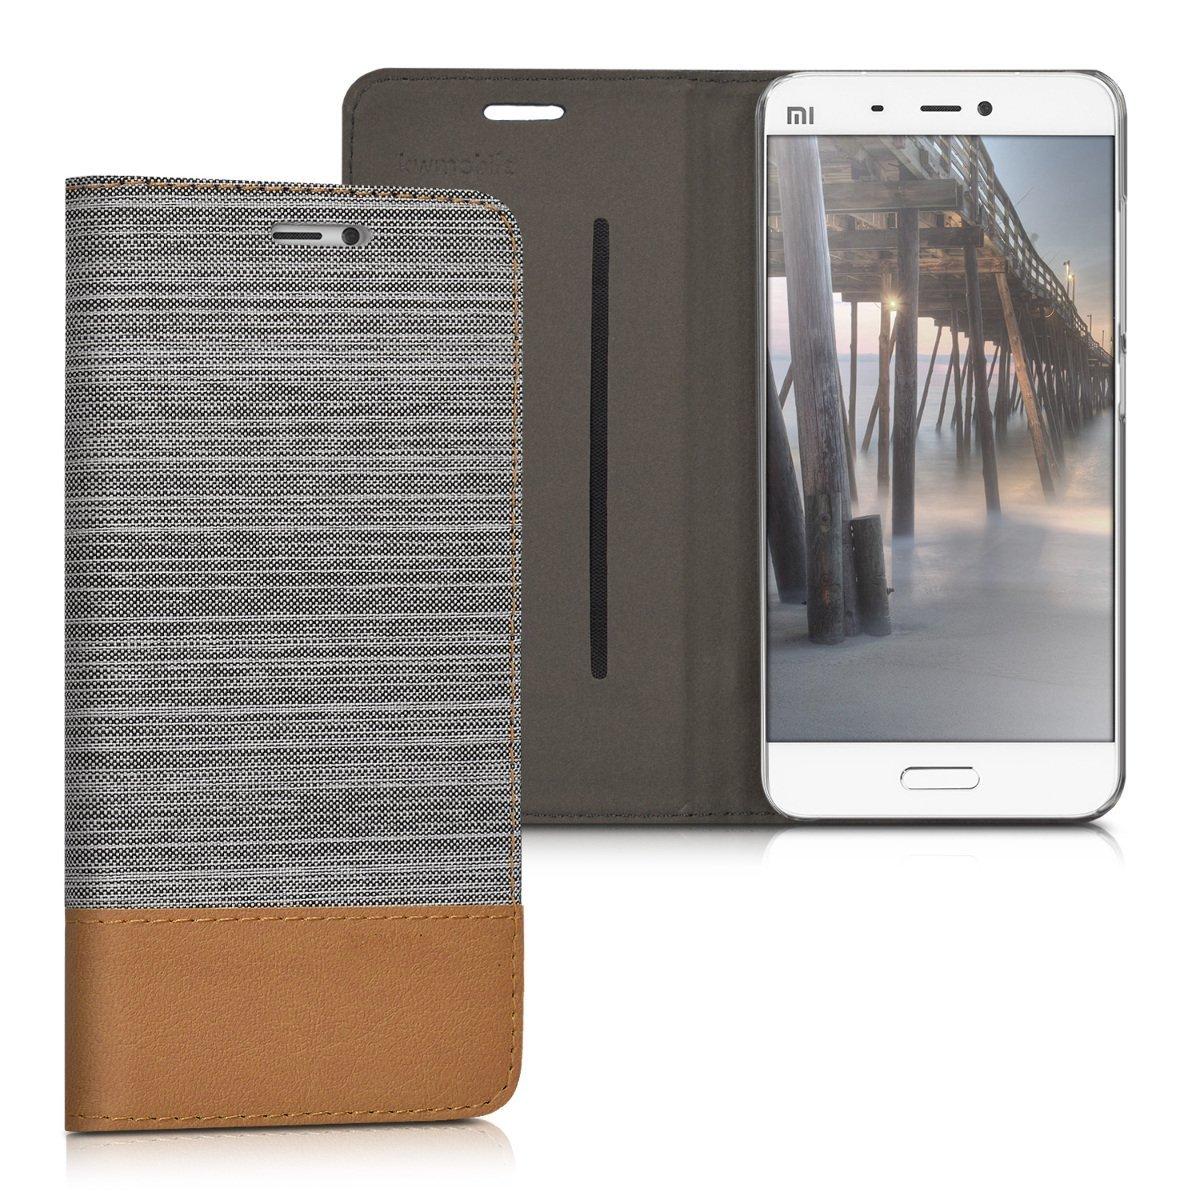 KW Θήκη - Πορτοφόλι Xiaomi Mi 5 - Light Grey/ Brown (38215.25)